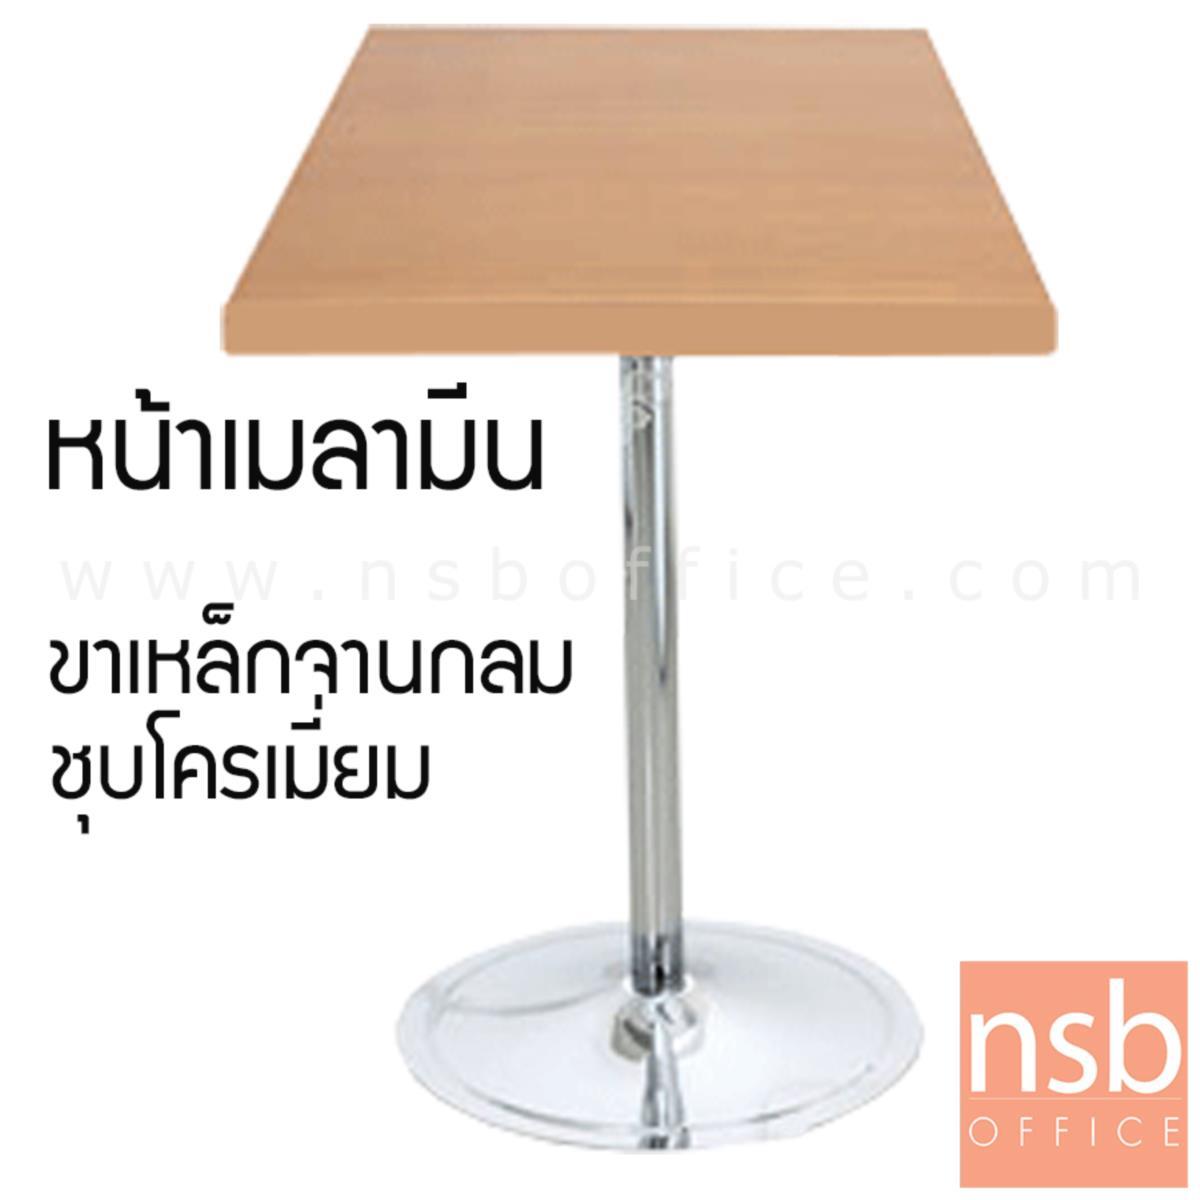 A07A038:โต๊ะหน้าเมลามีน 25 มม. รุ่น Beaumont 1 (โบมอนต์ 1) ขนาด 60W ,75W ,60Di ,75Di cm.  ขาเหล็กฐานจานกลมโครเมี่ยม